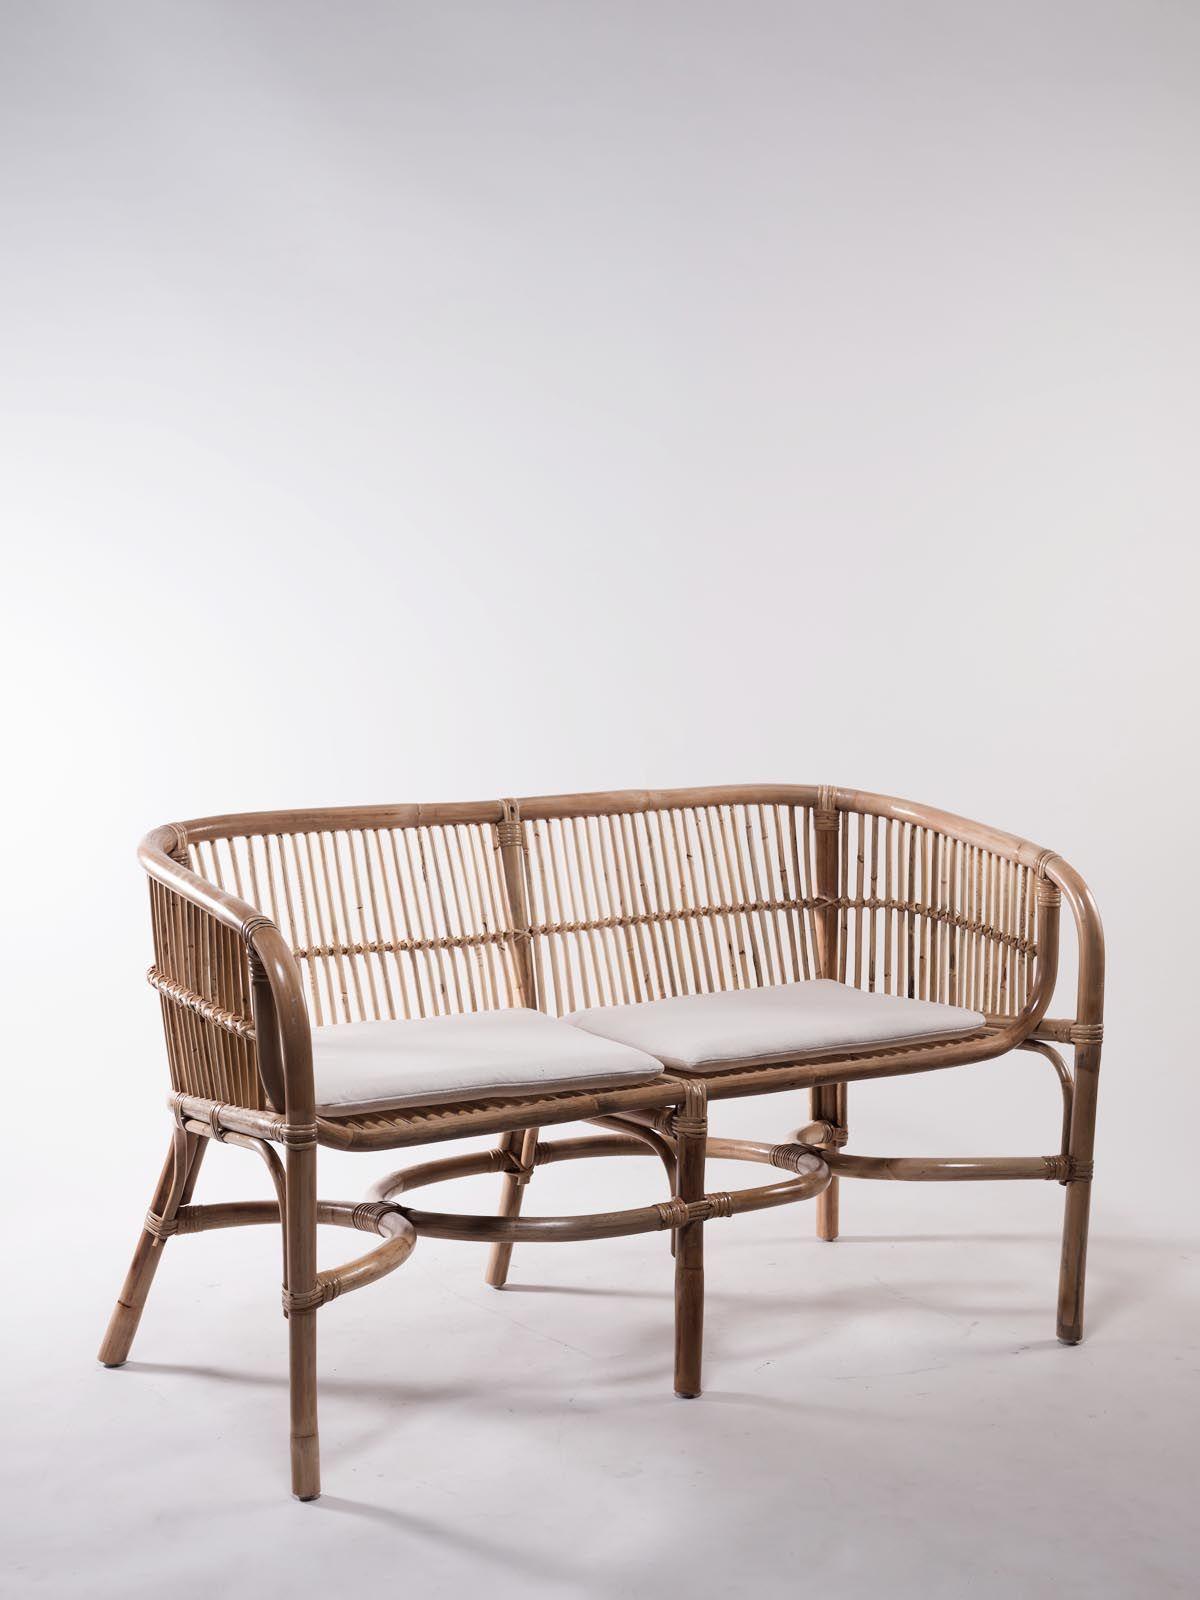 Nagarey Creta Two Seater Lounge Chair